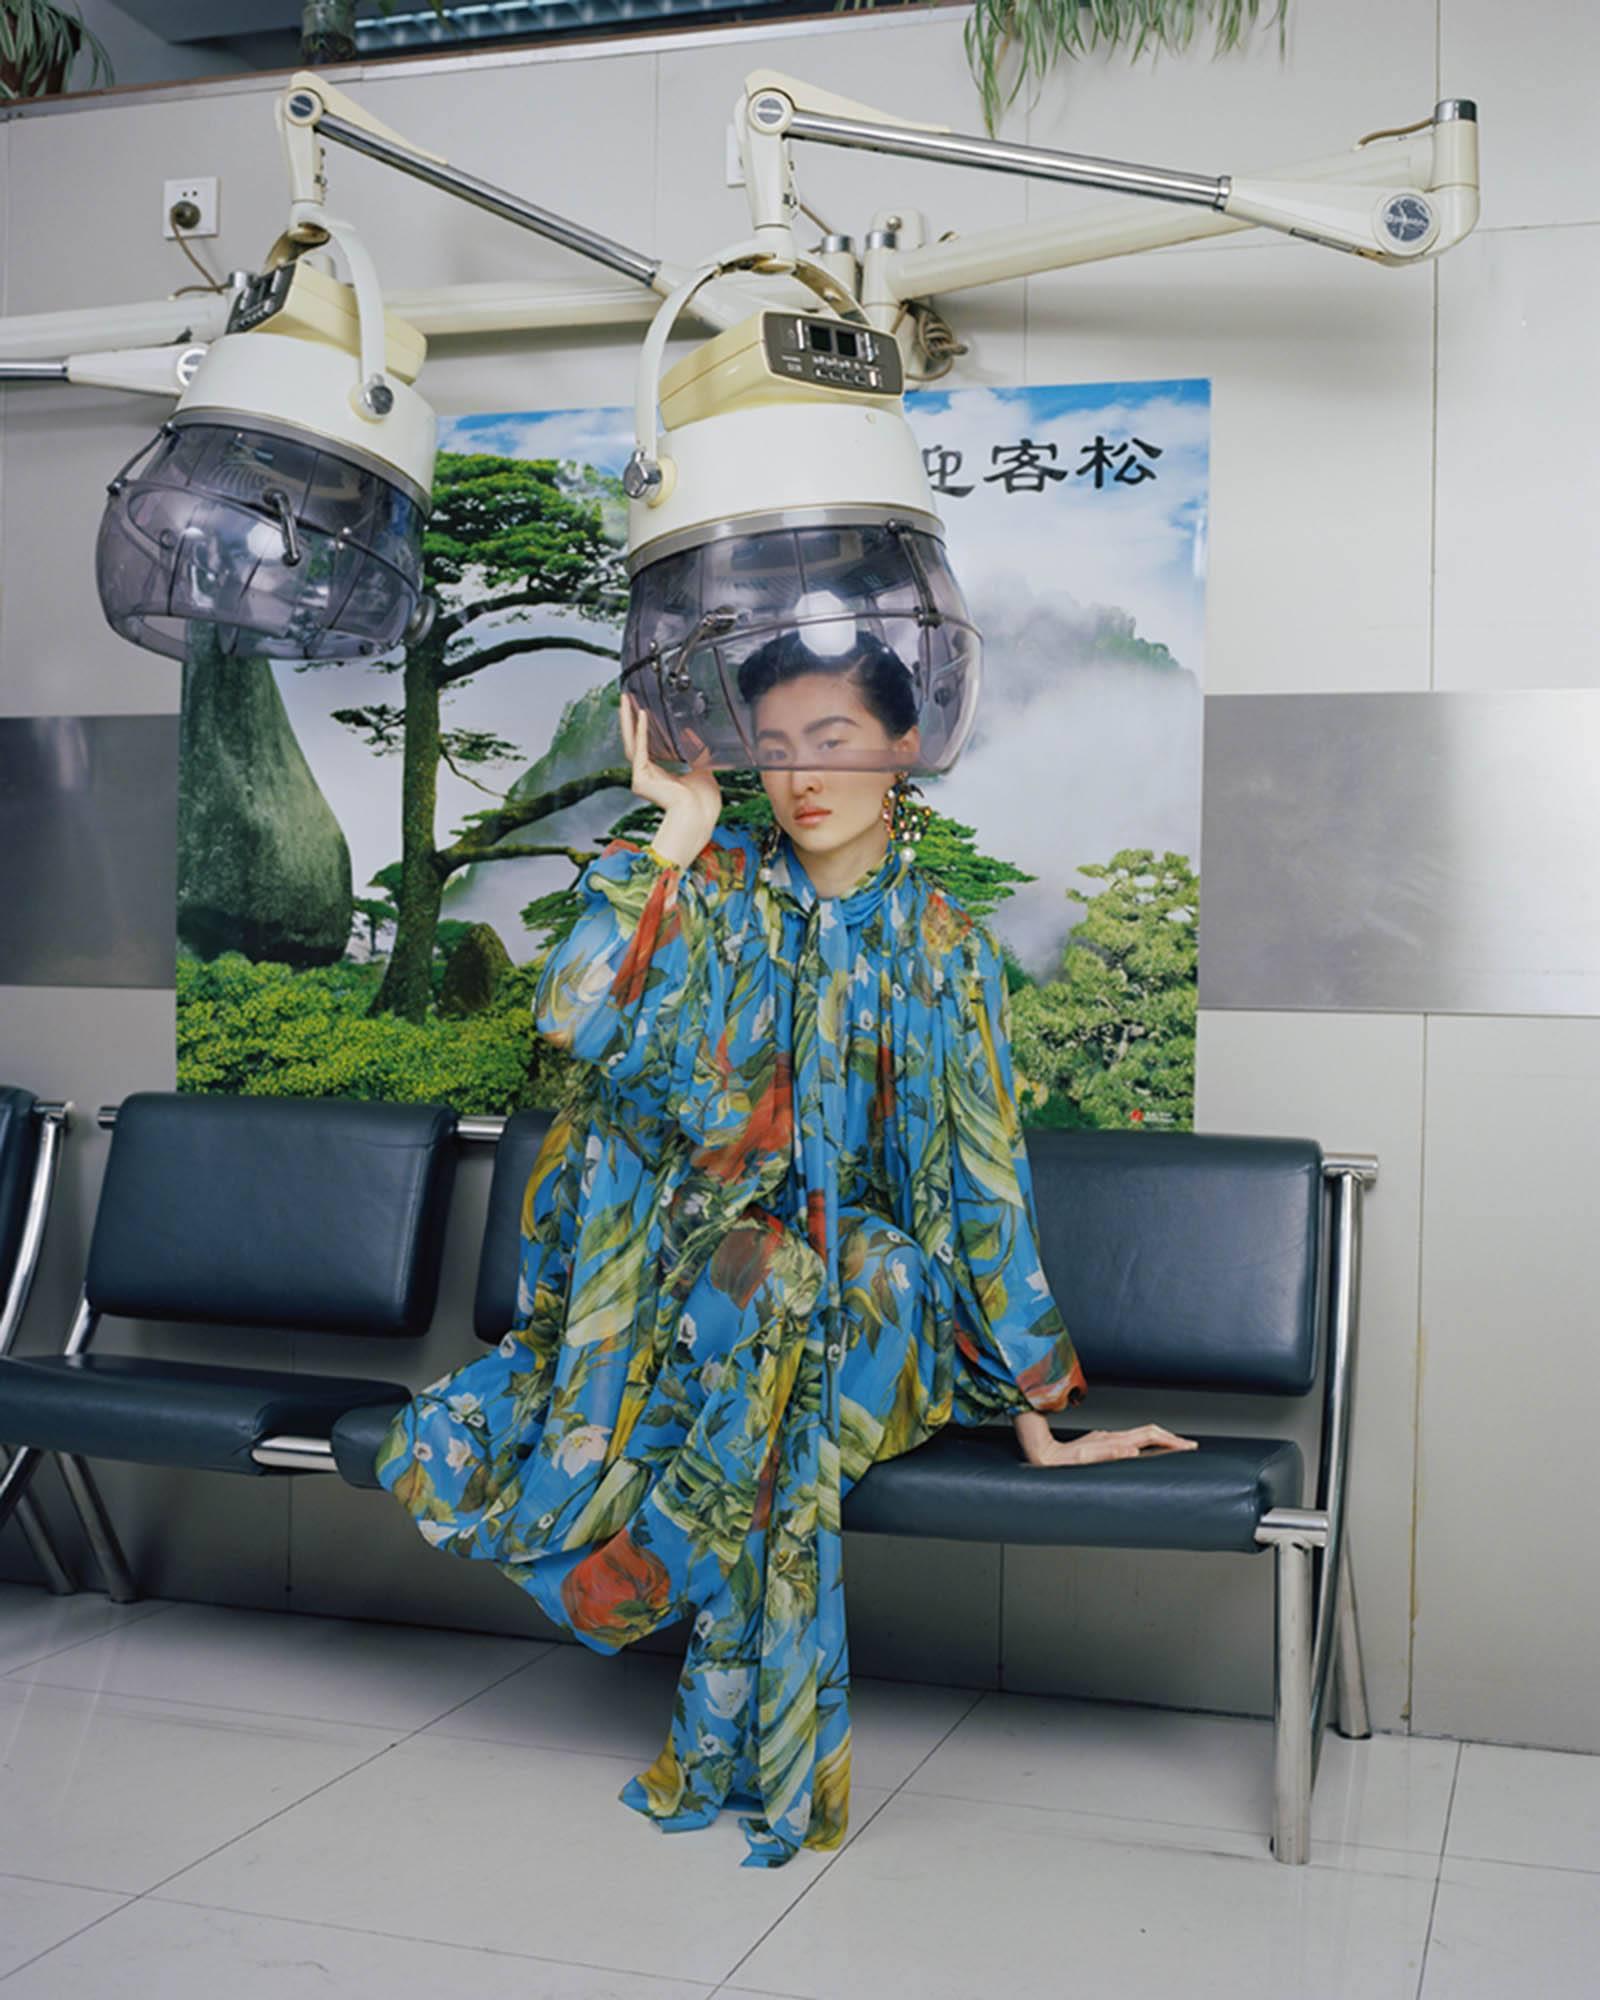 iGNANT-Photography-Leslie-Zhang-05